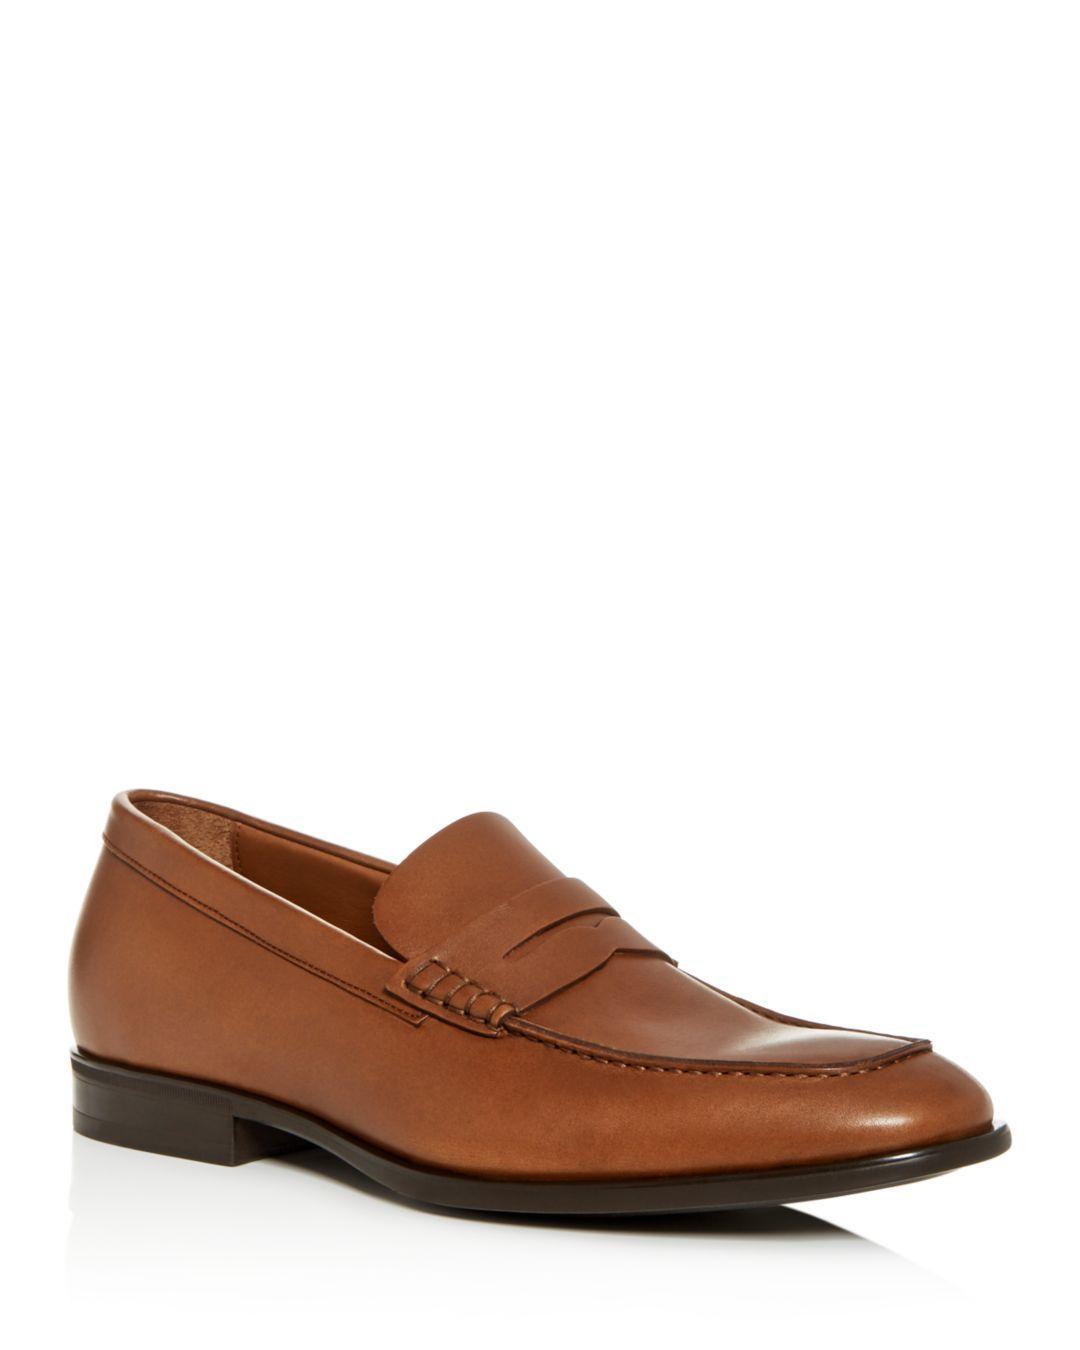 3729efd7929 Lyst - Aquatalia Men s Adamo Weatherproof Leather Penny Loafers in ...